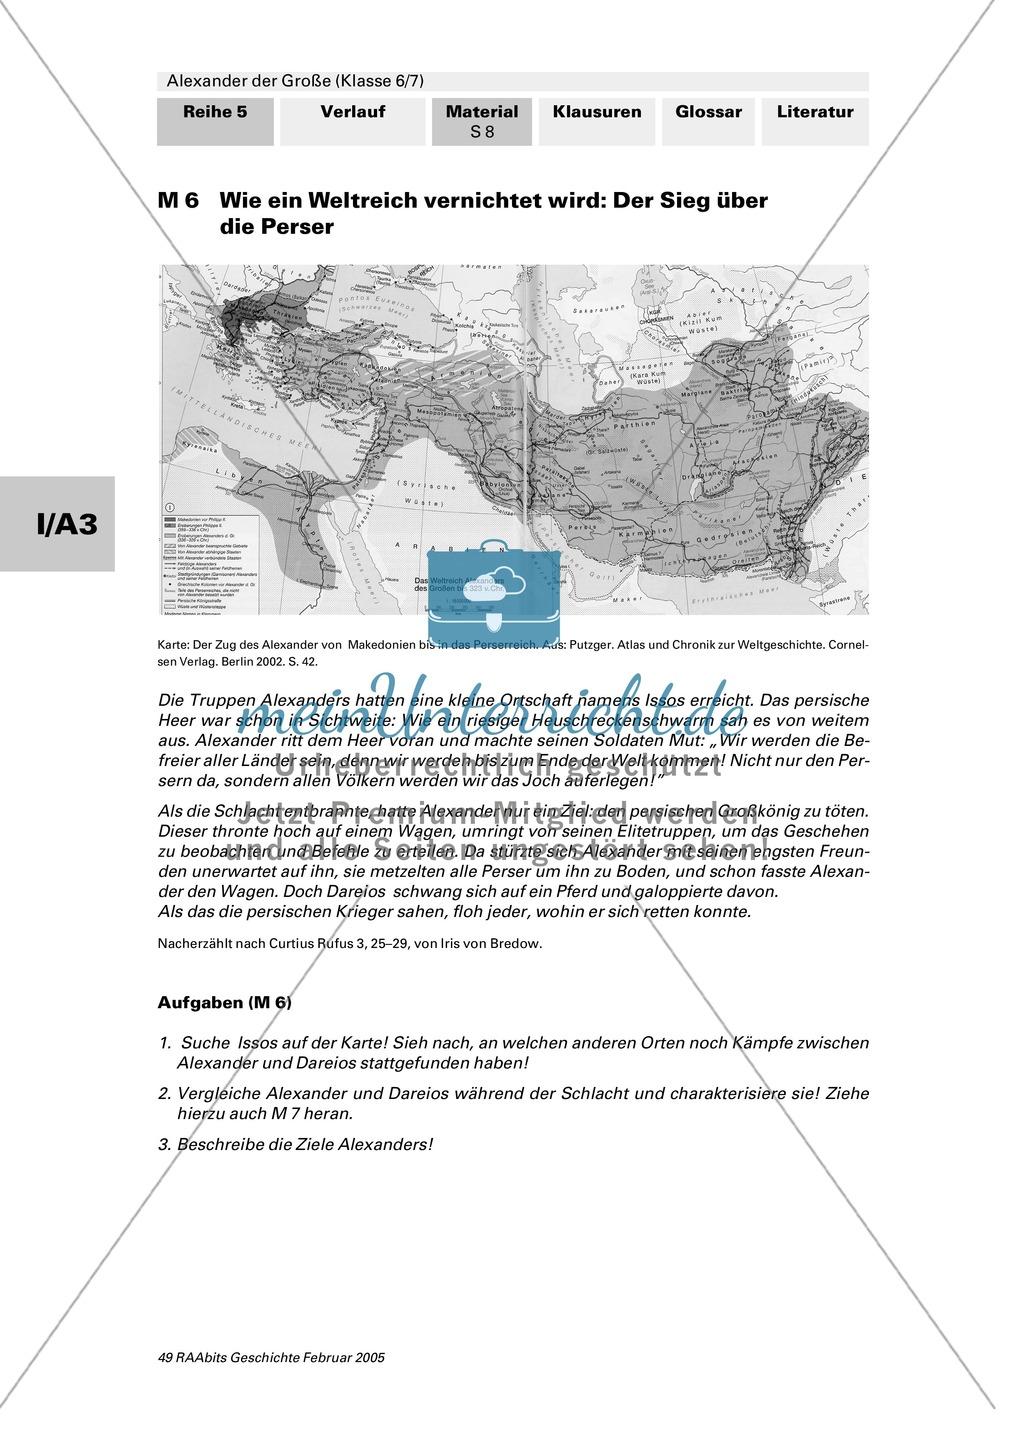 Alexander der Große: Eroberungsfeldzüge an Autorentexten, Karten, Bildern Preview 3